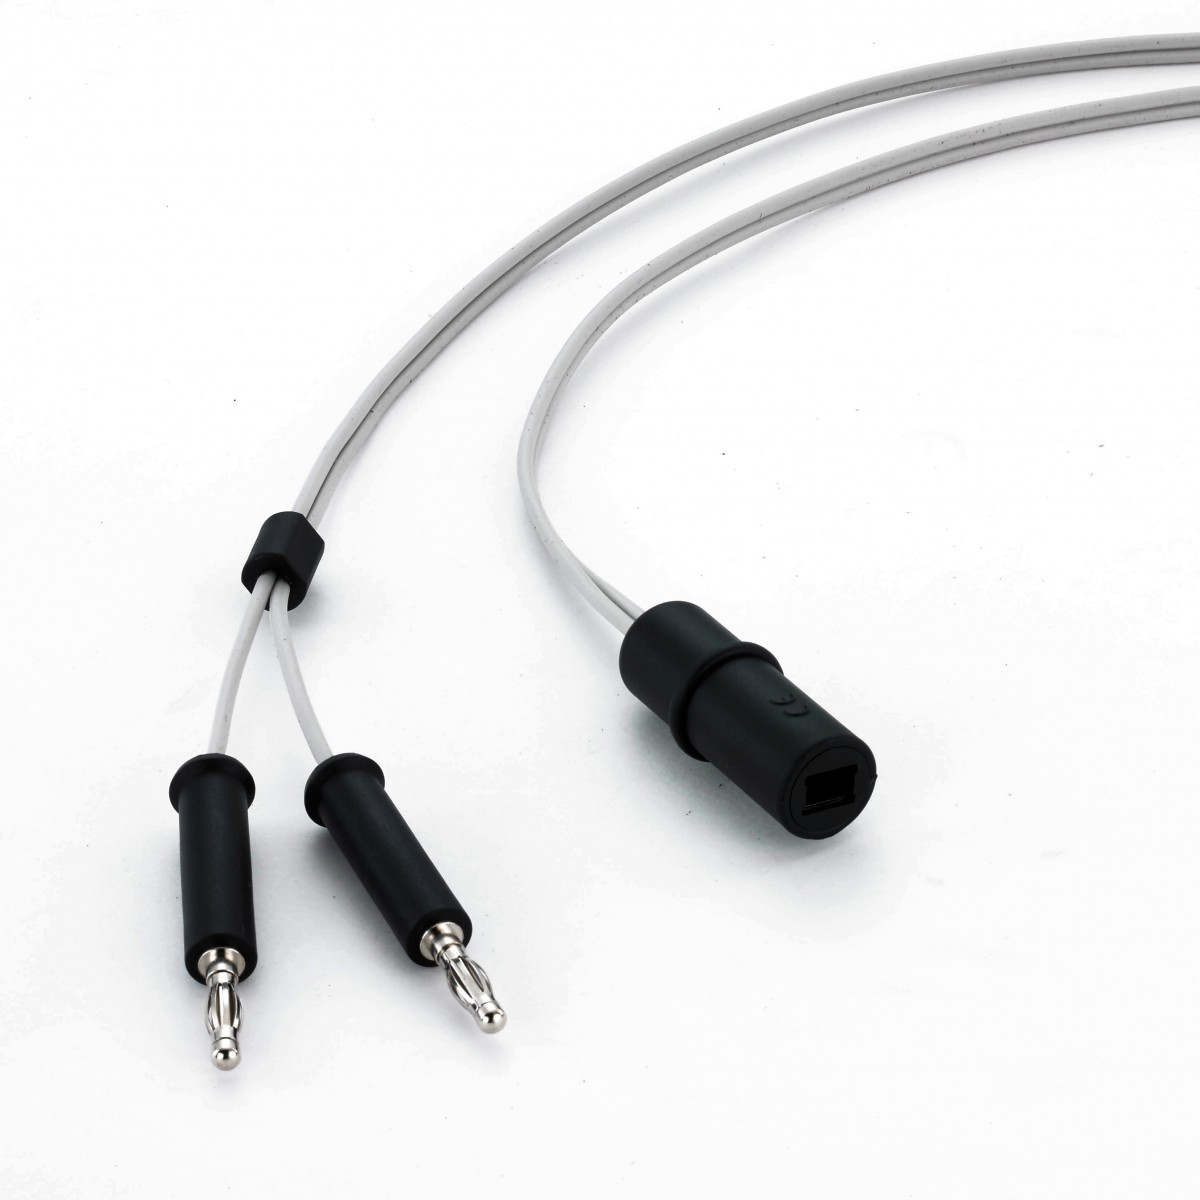 Reusable Bipolar Cable, 4mm Banana Plugs + European Forceps Socket